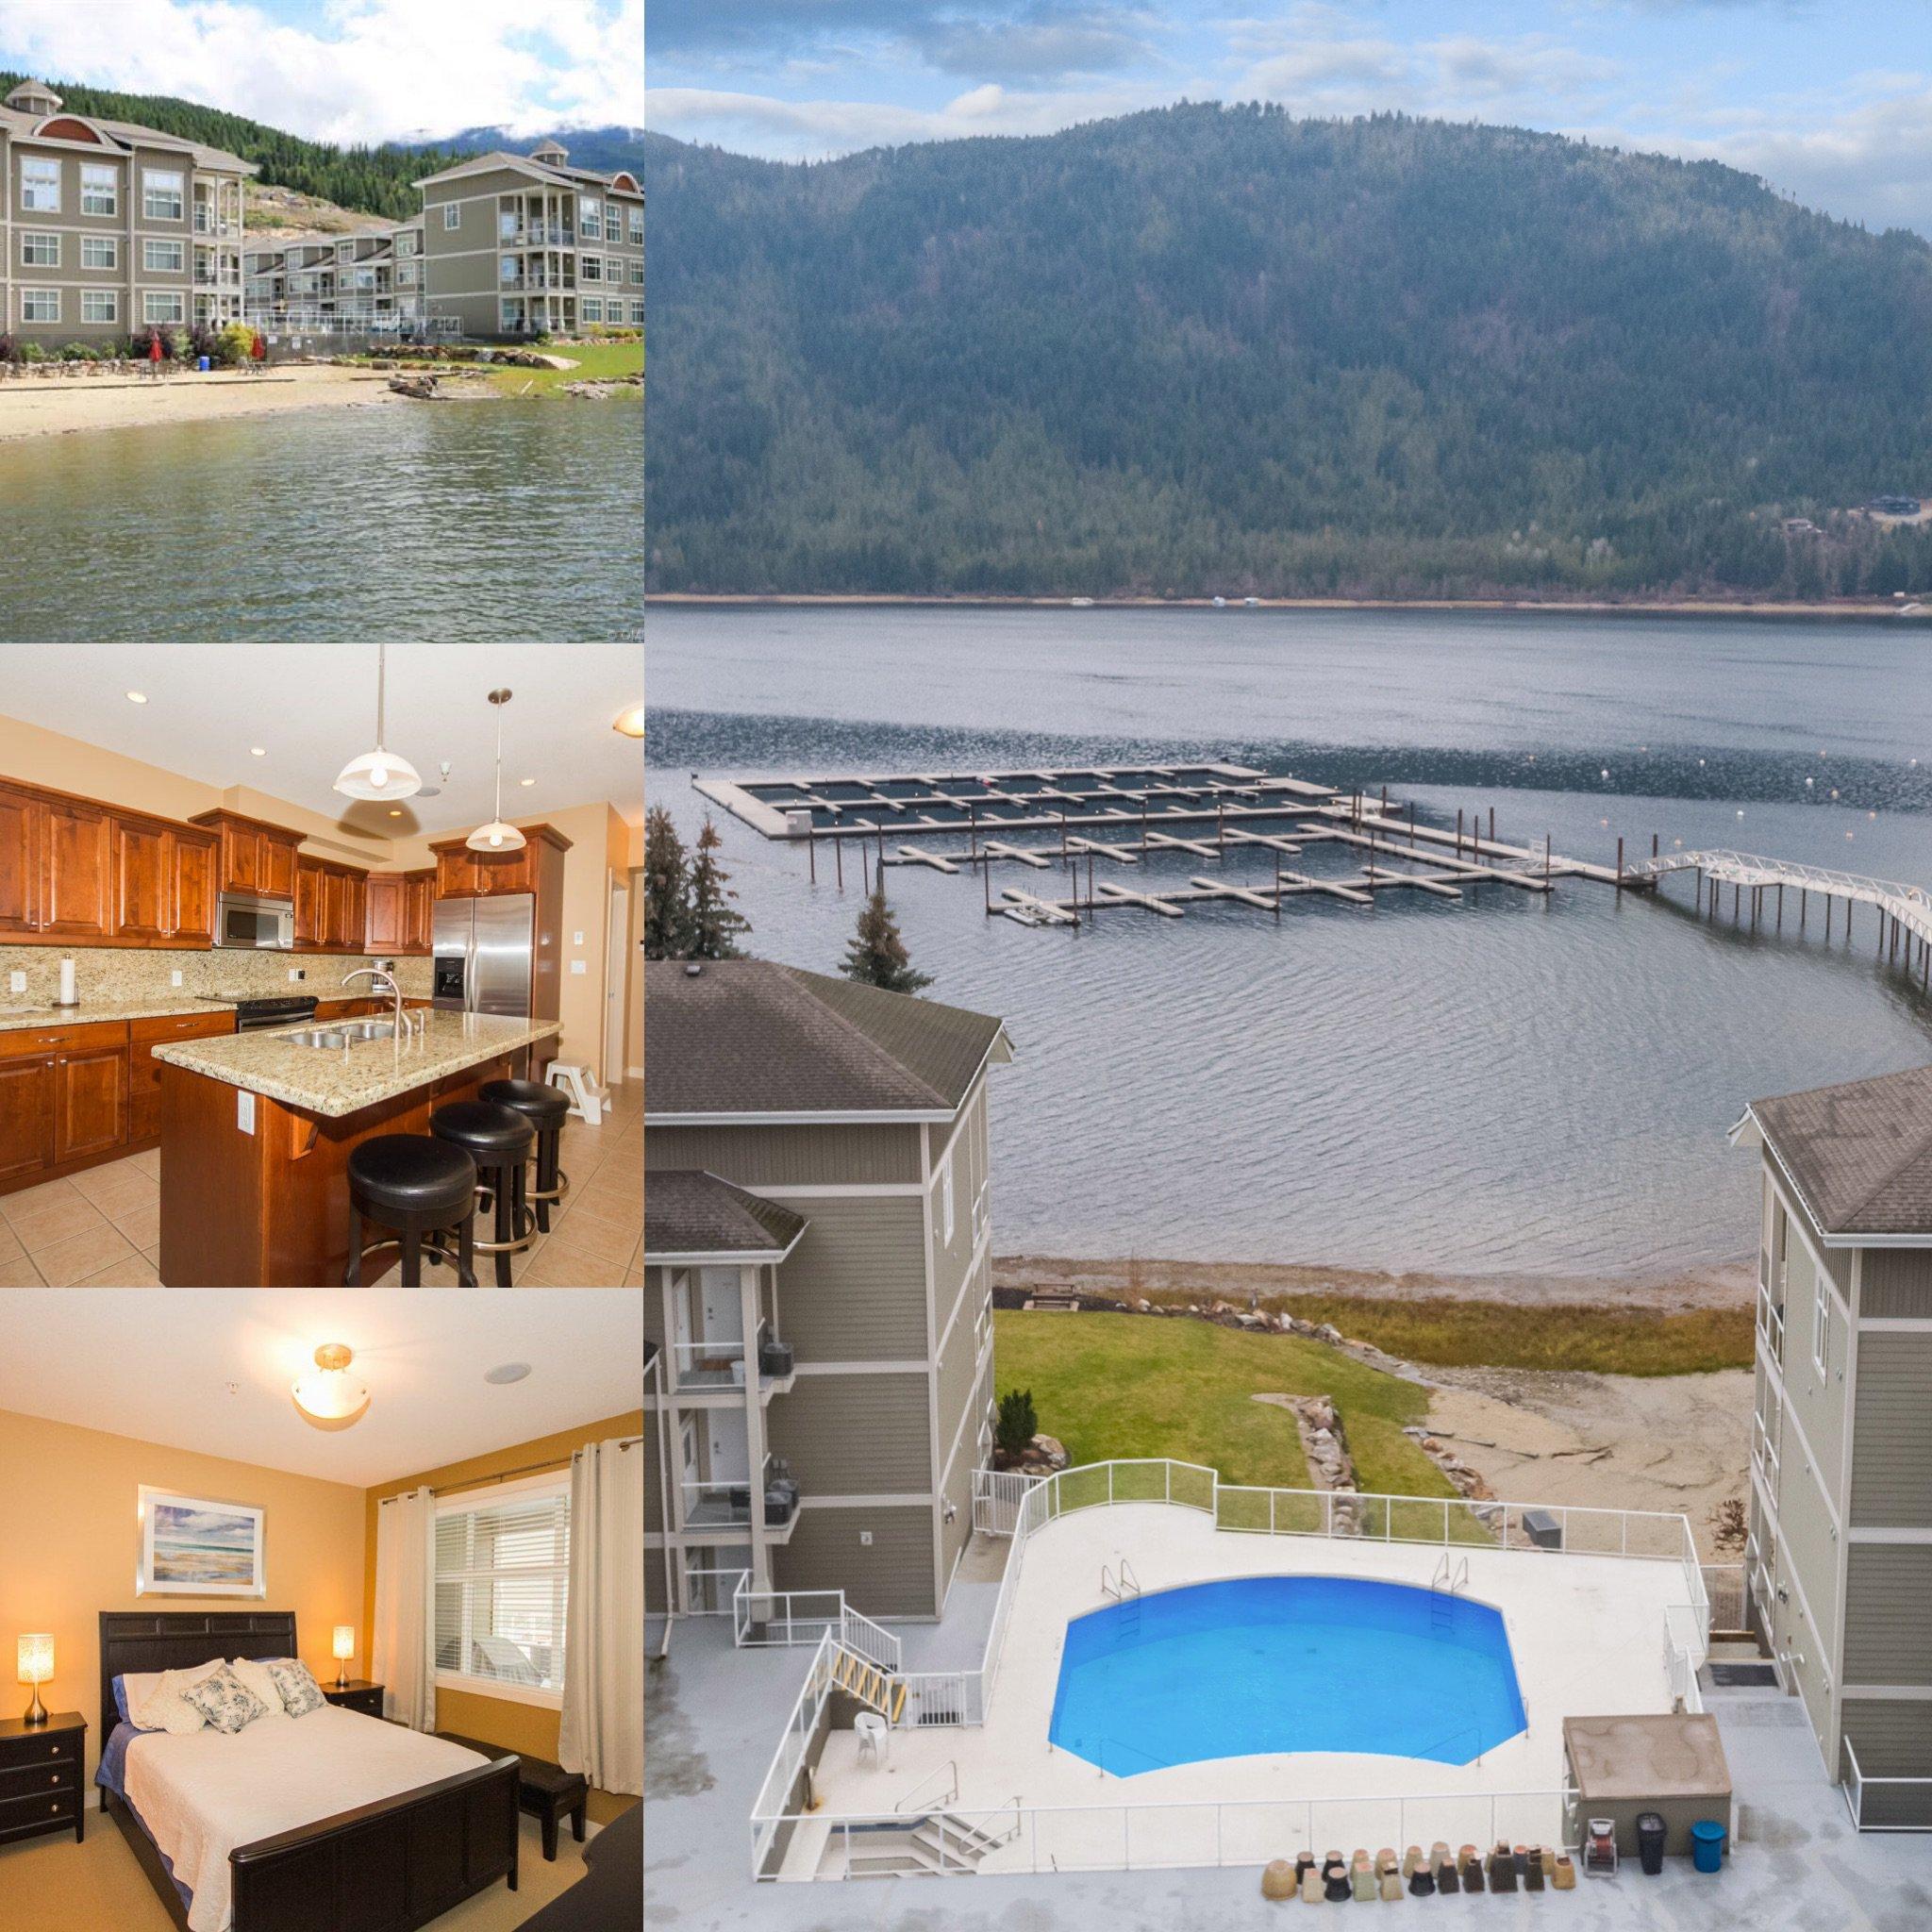 Main Photo: #105 302 Mara Lake Lane in : Sicamous Property for sale (SM)  : MLS®# 10172103